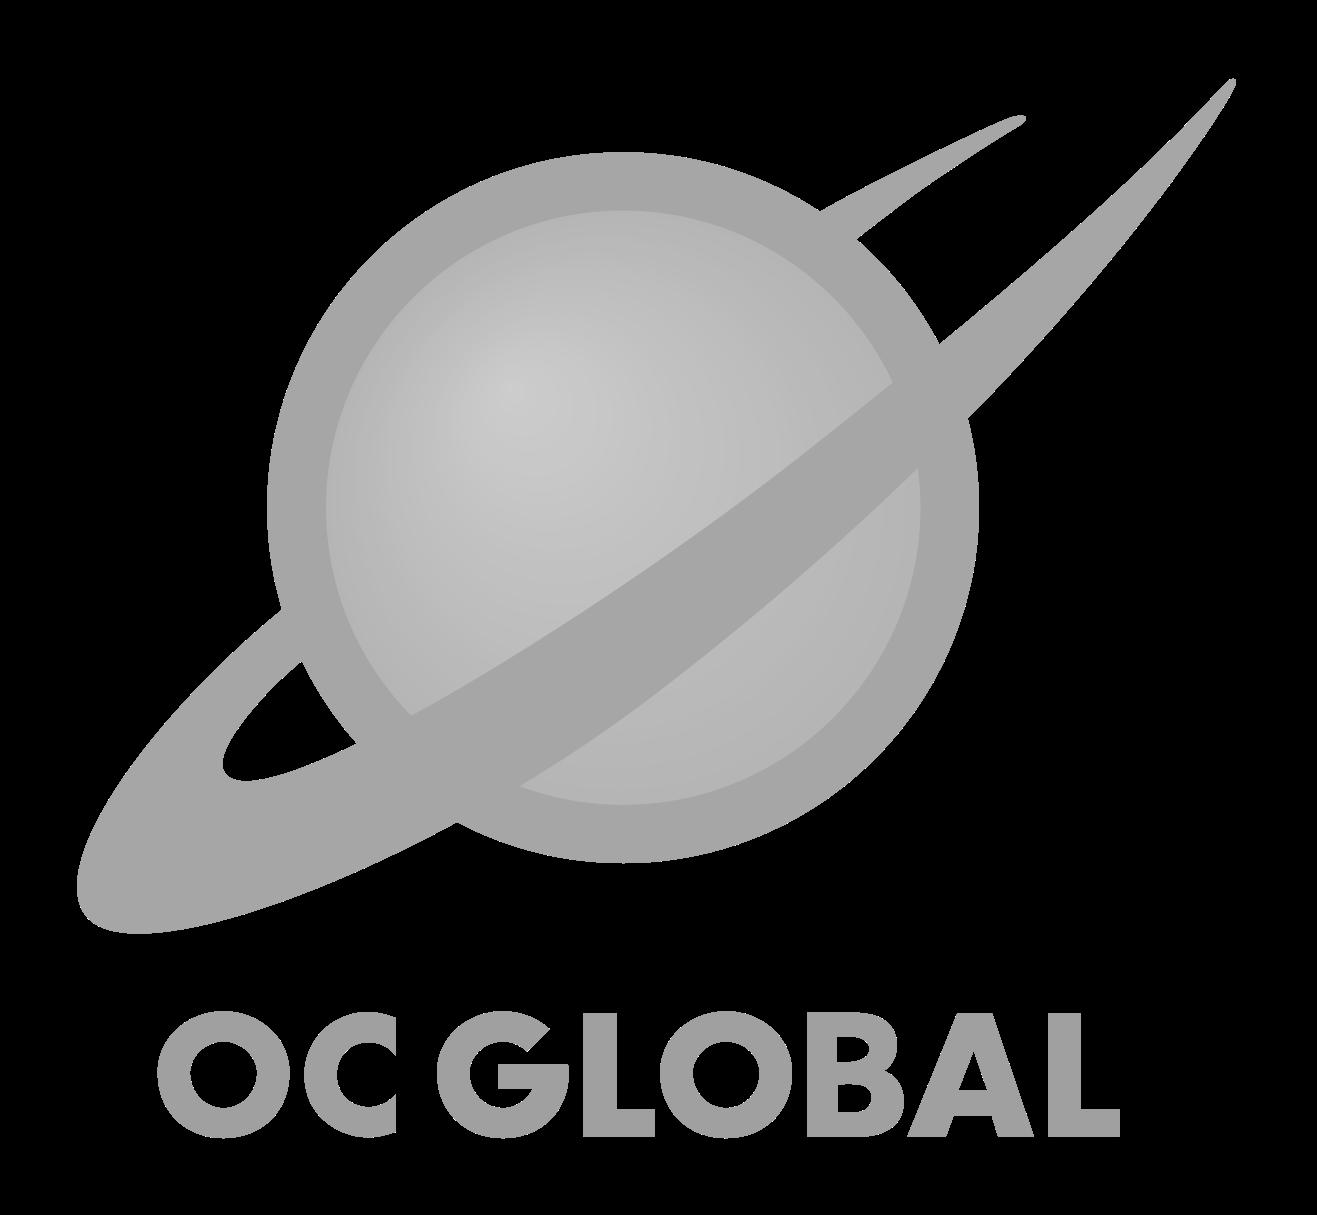 OC-Grobal.png